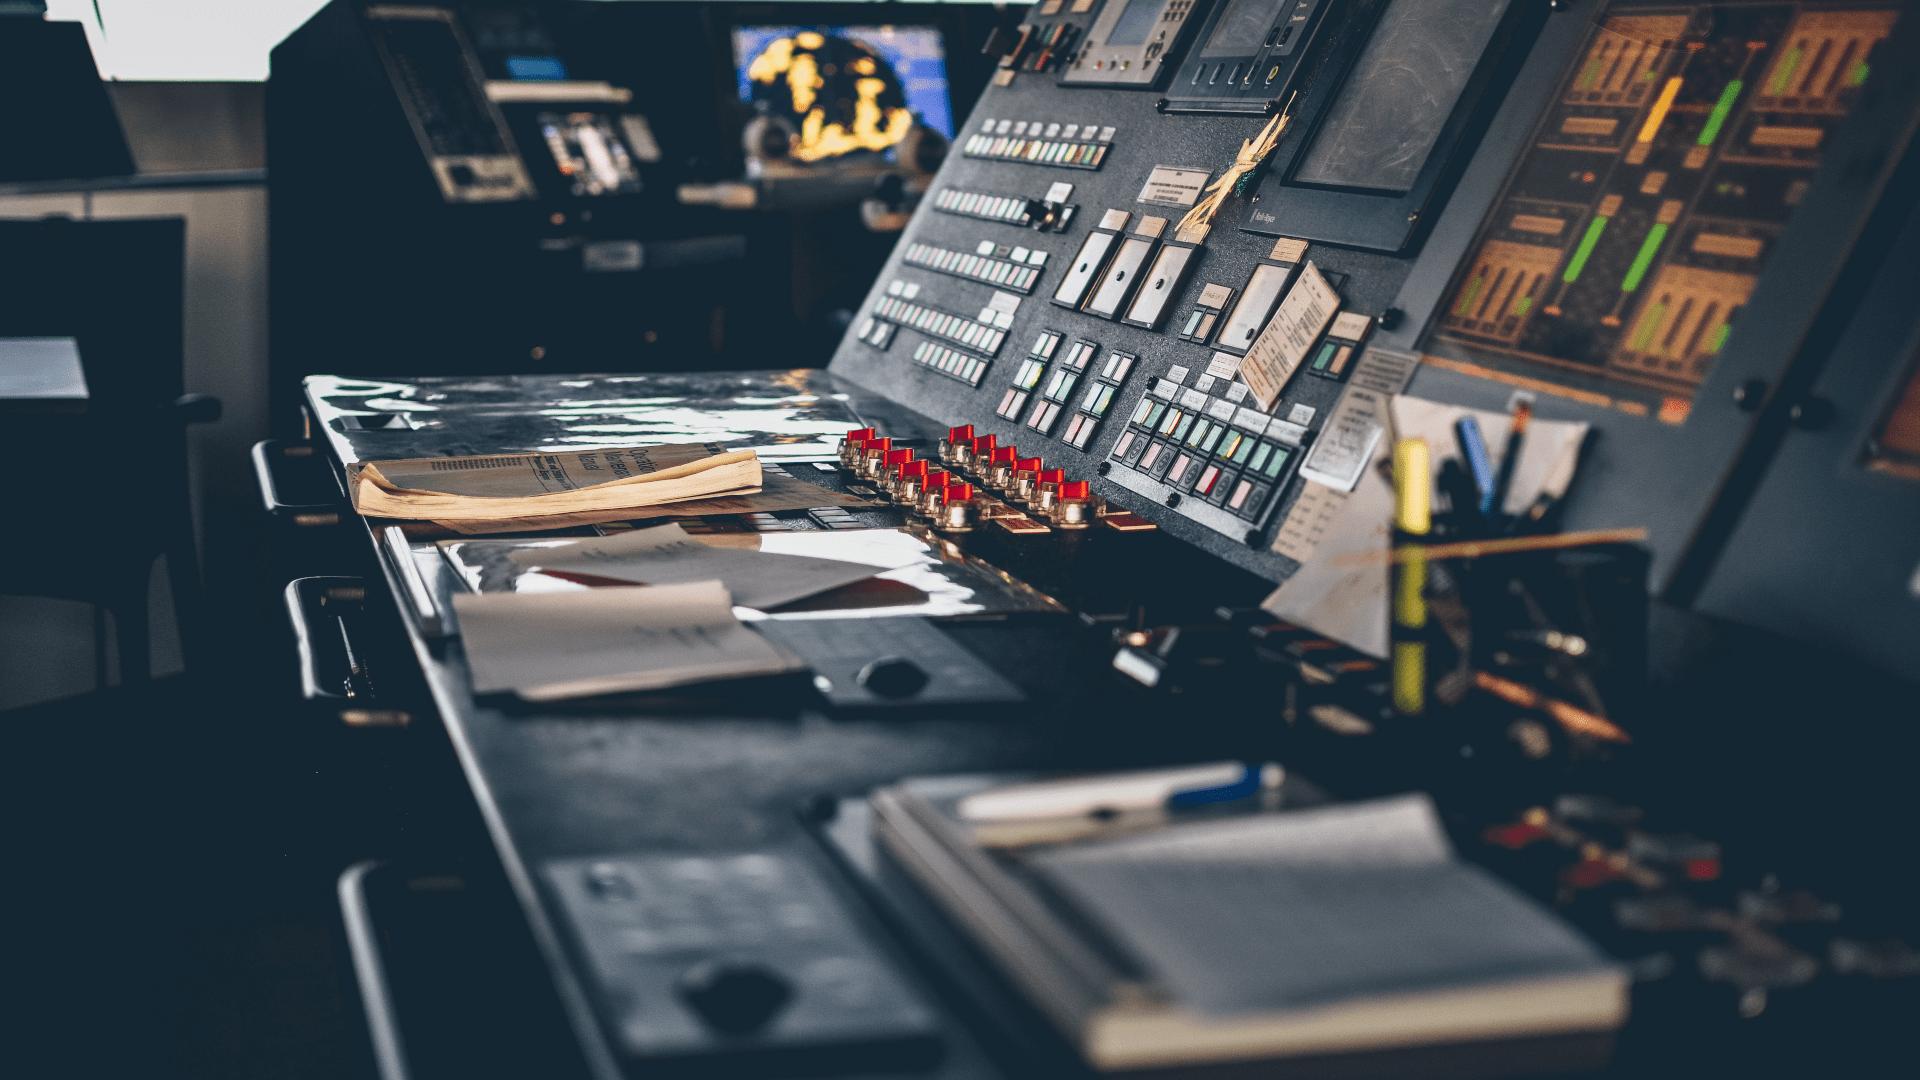 sala-controle-transformar equipe fábrica